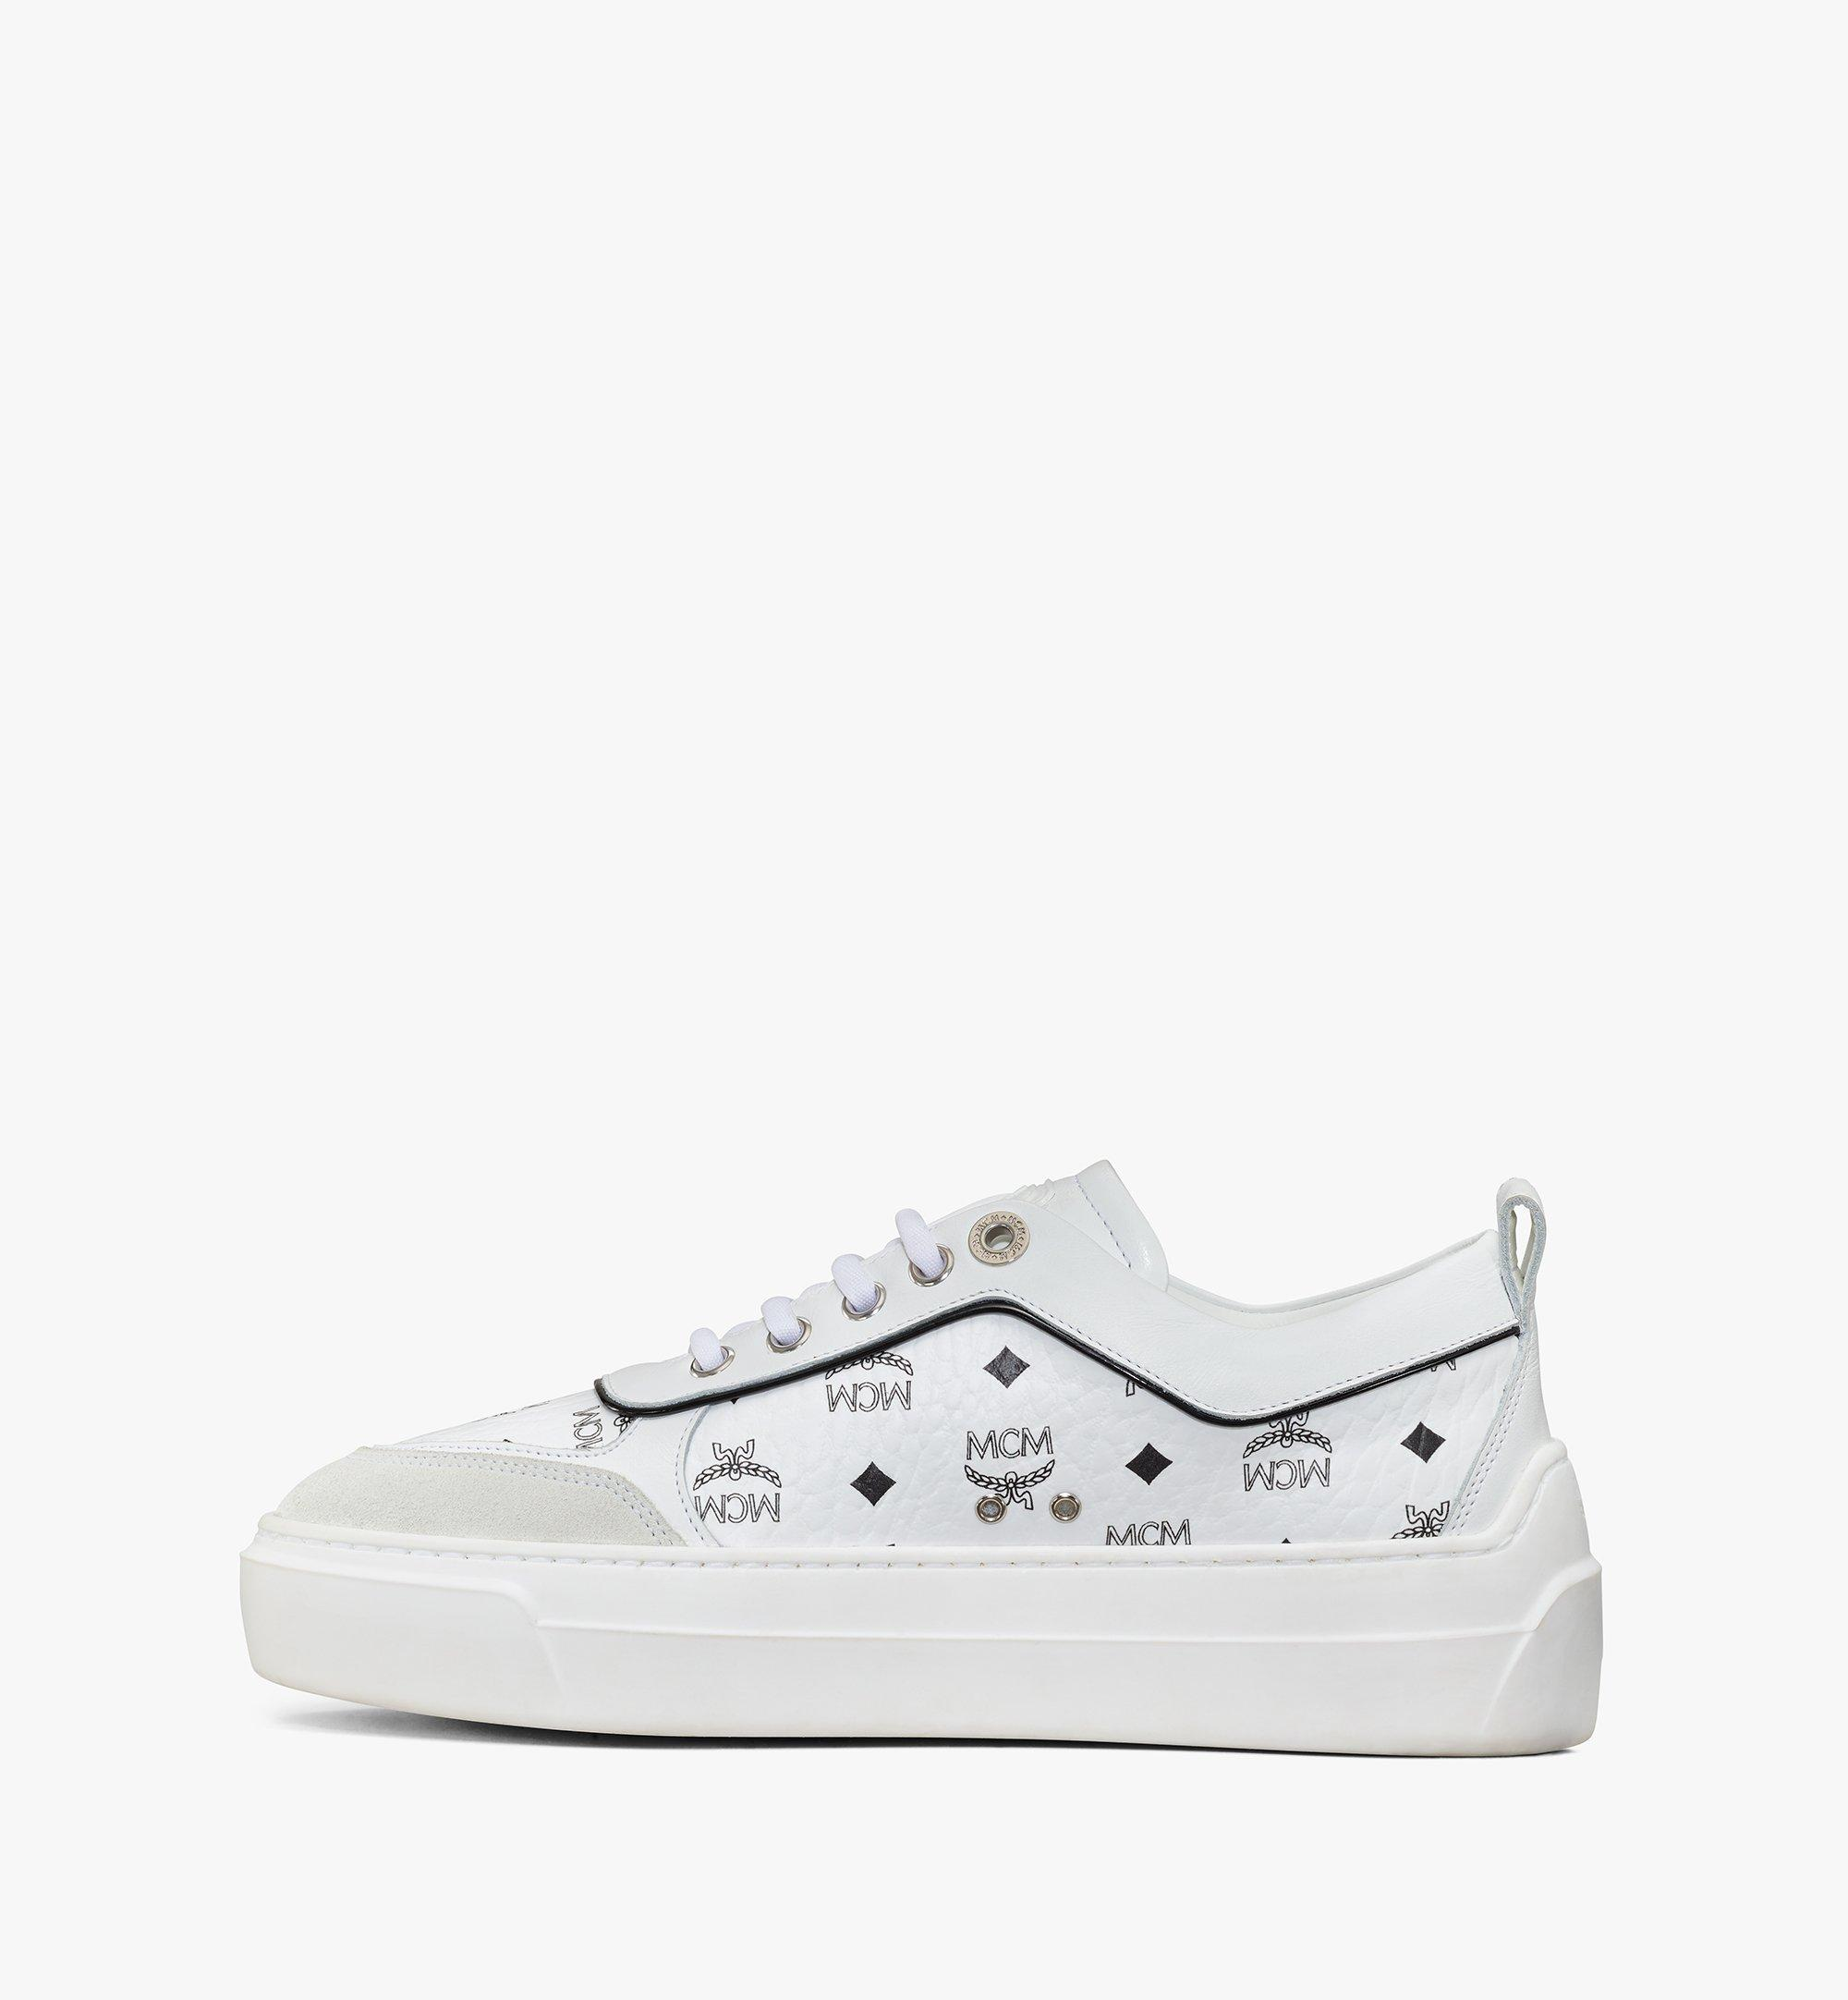 MCM 女士Skyward Visetos厚底运动鞋 White MESAAMM19WT035 更多视角 1